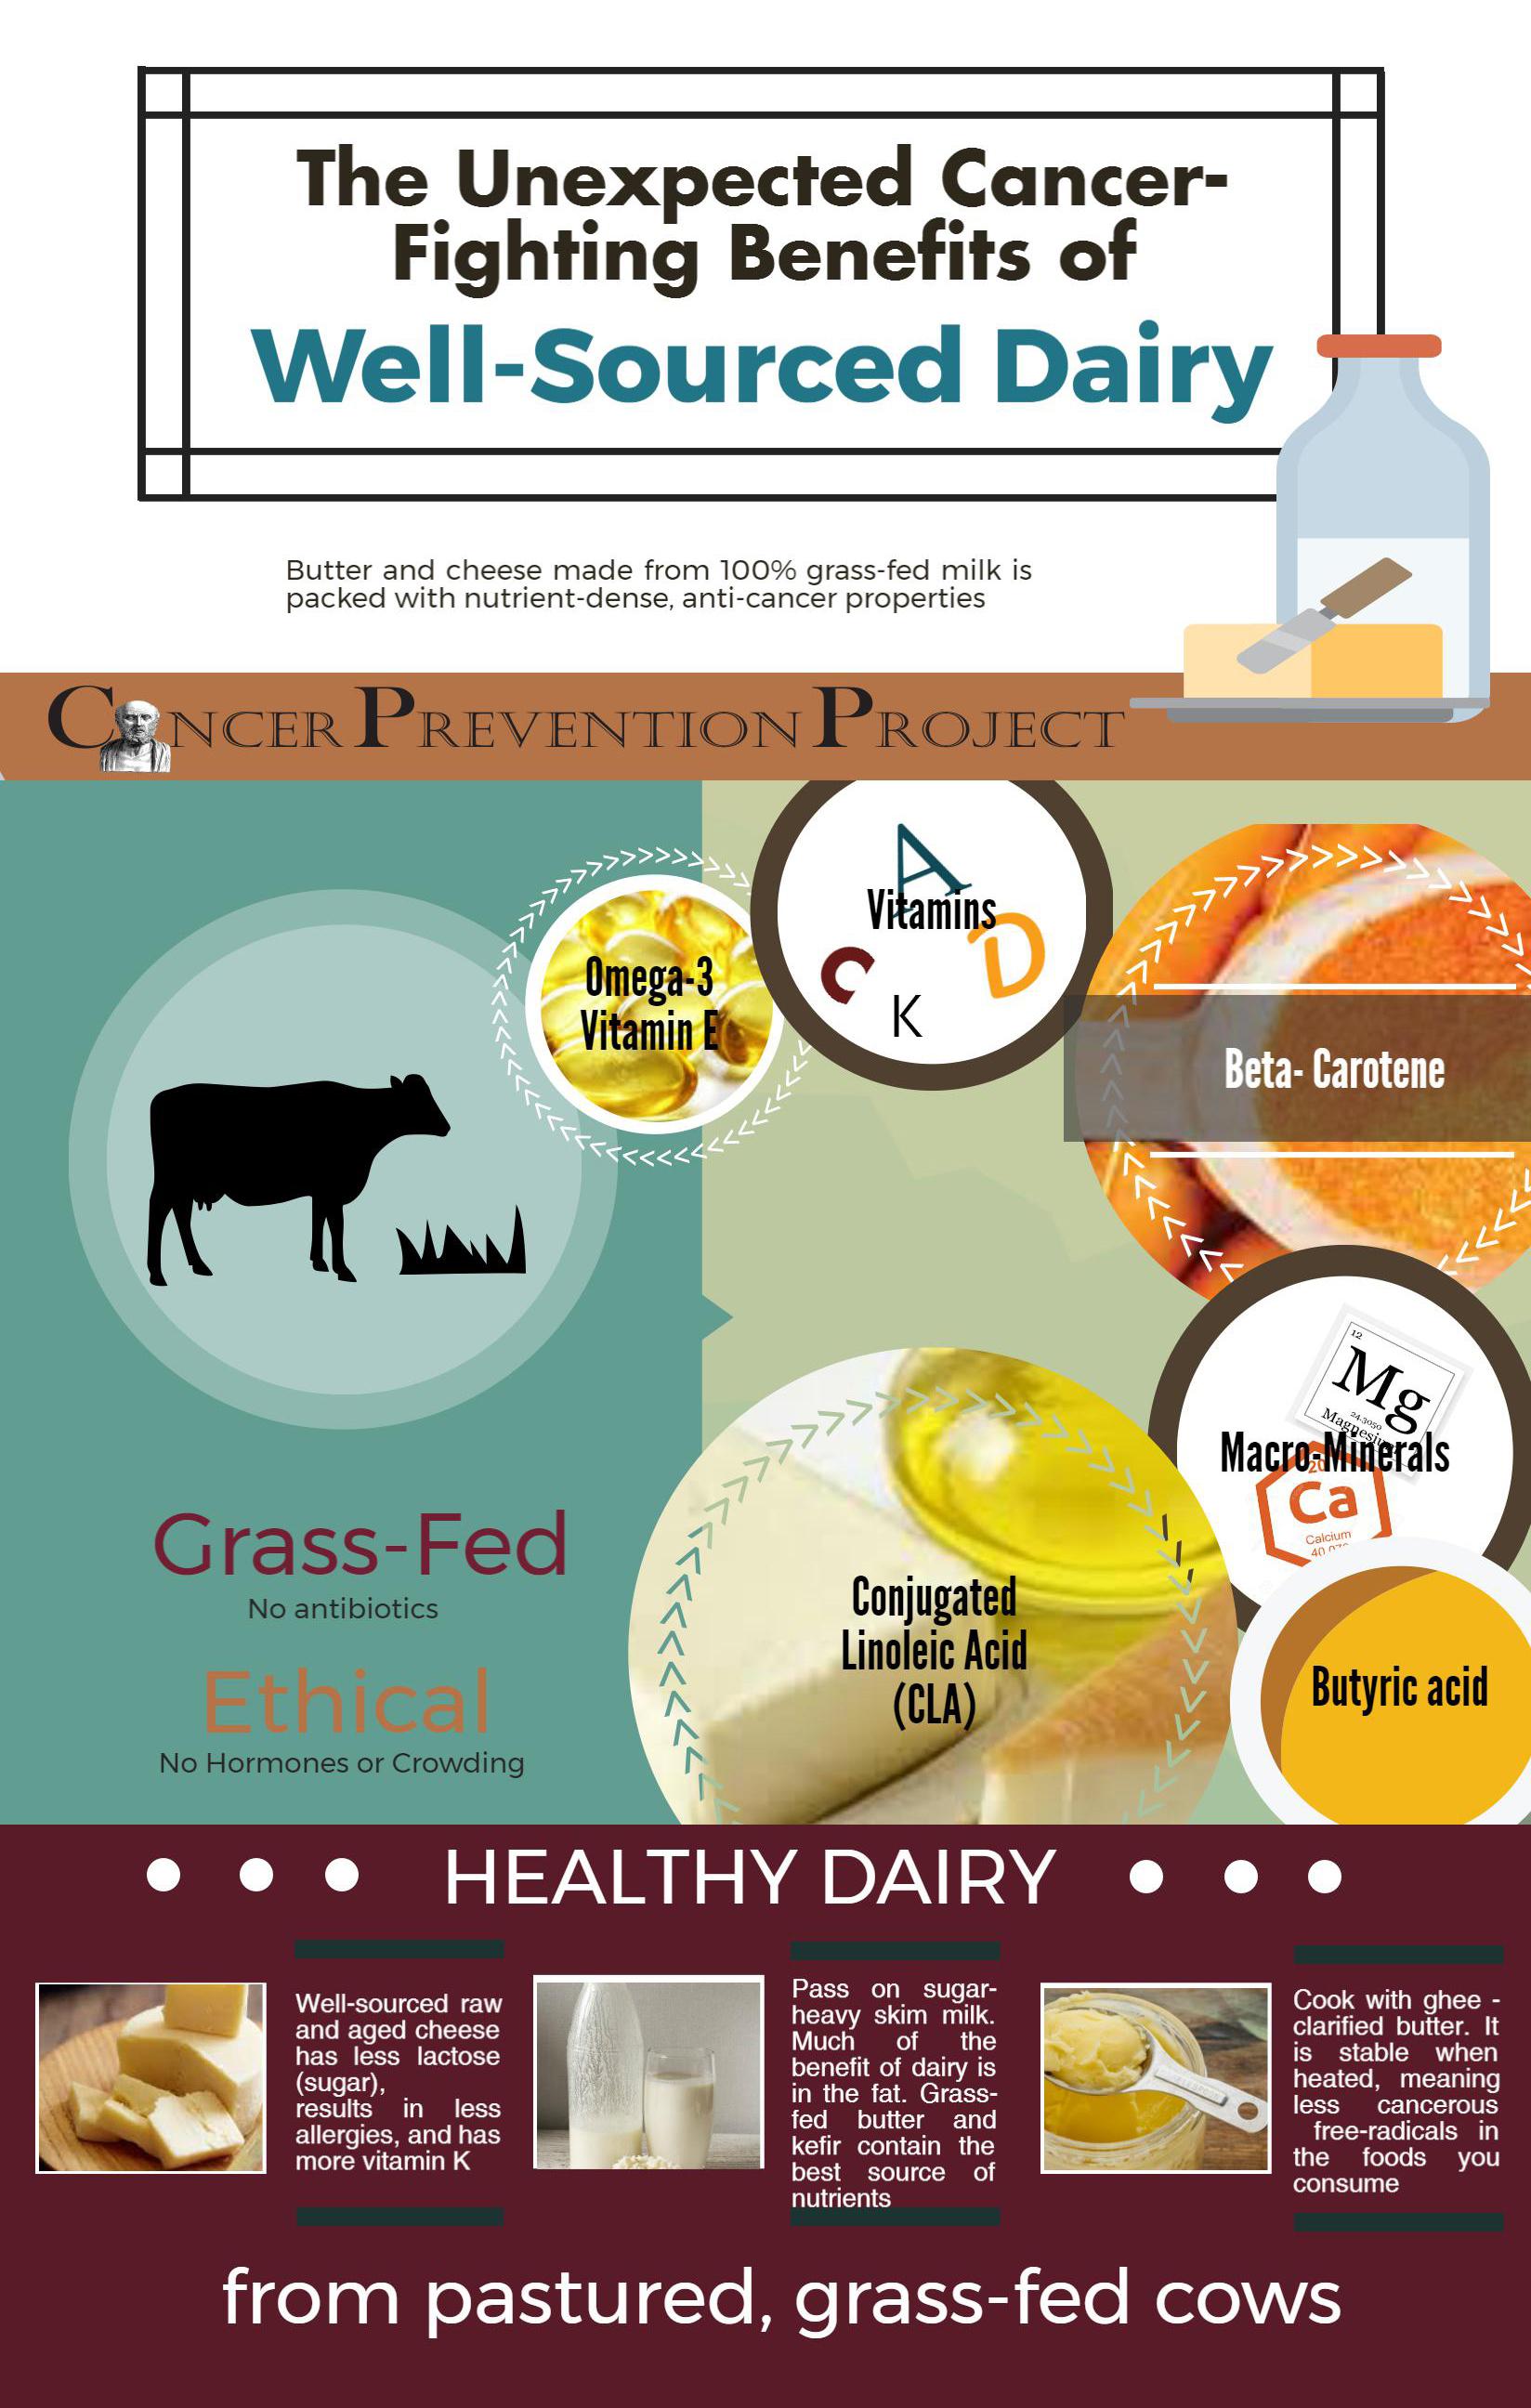 Health Dairy